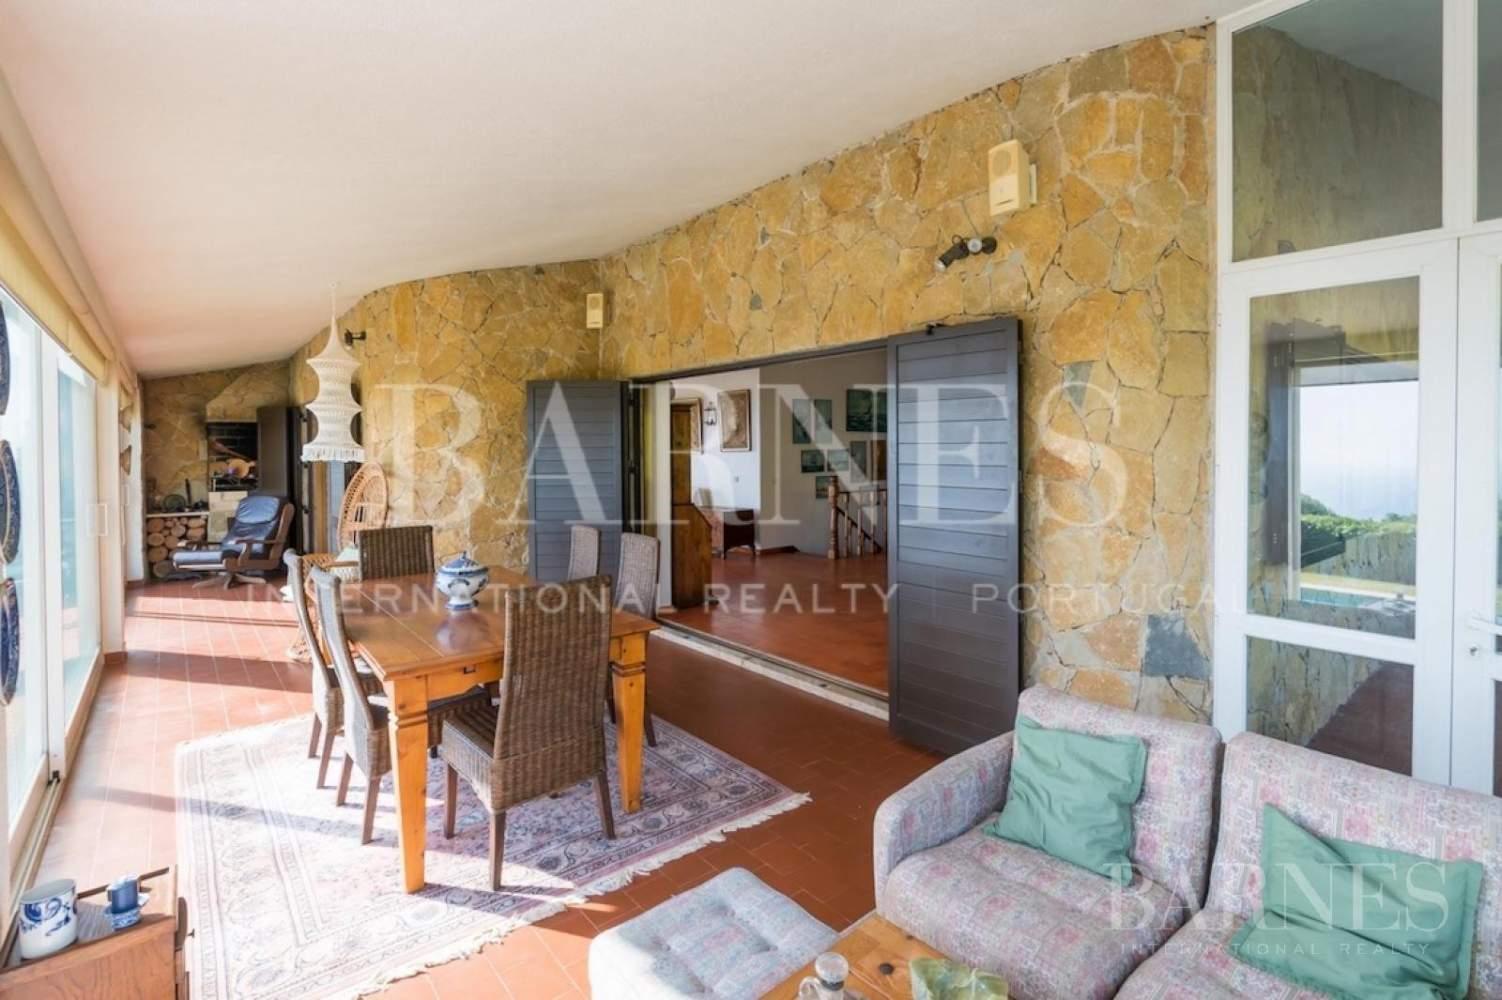 Malveira da Serra  - Maison 4 Pièces 3 Chambres - picture 3